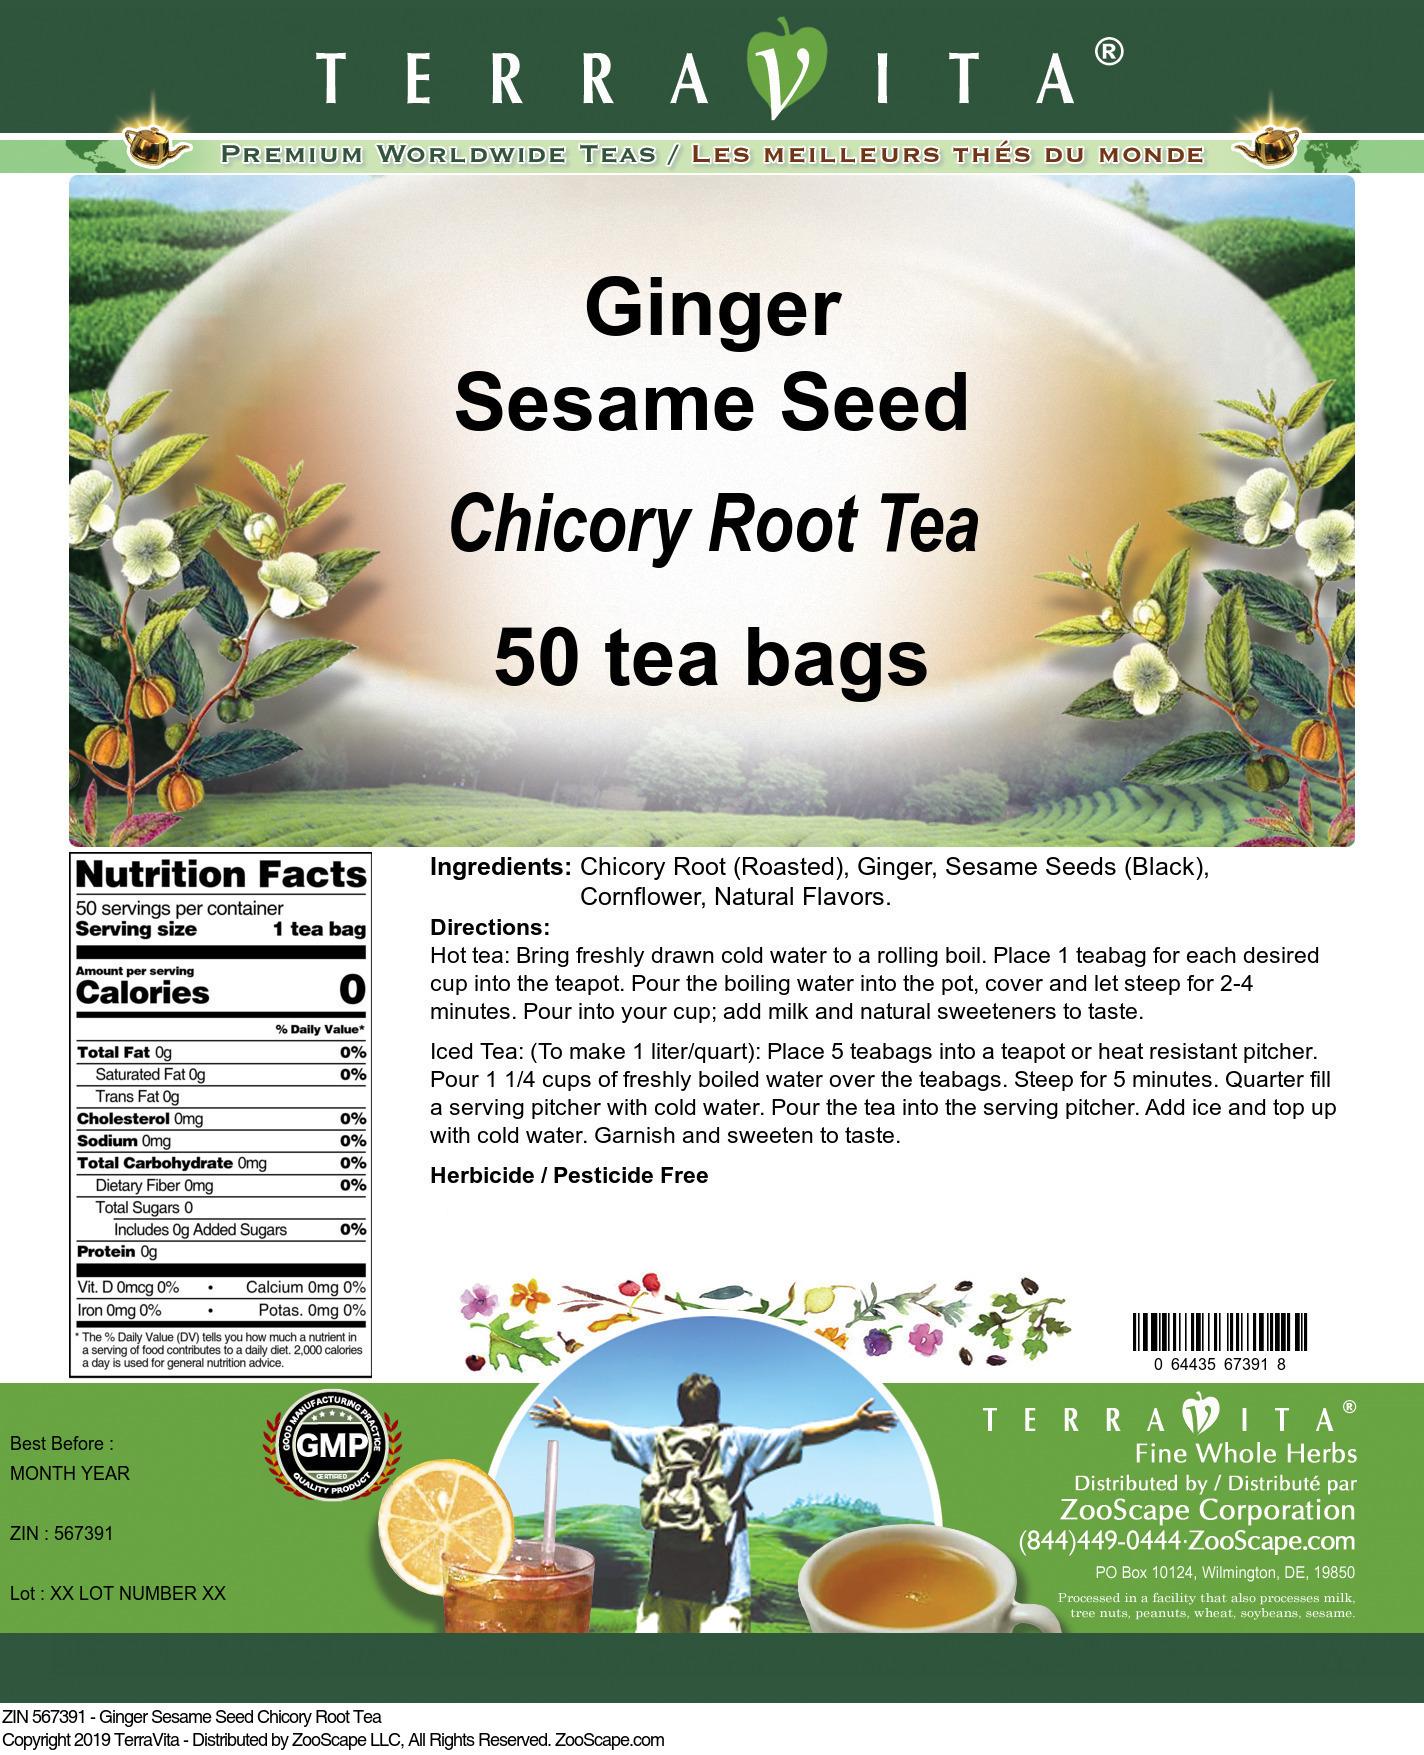 Ginger Sesame Seed Chicory Root Tea